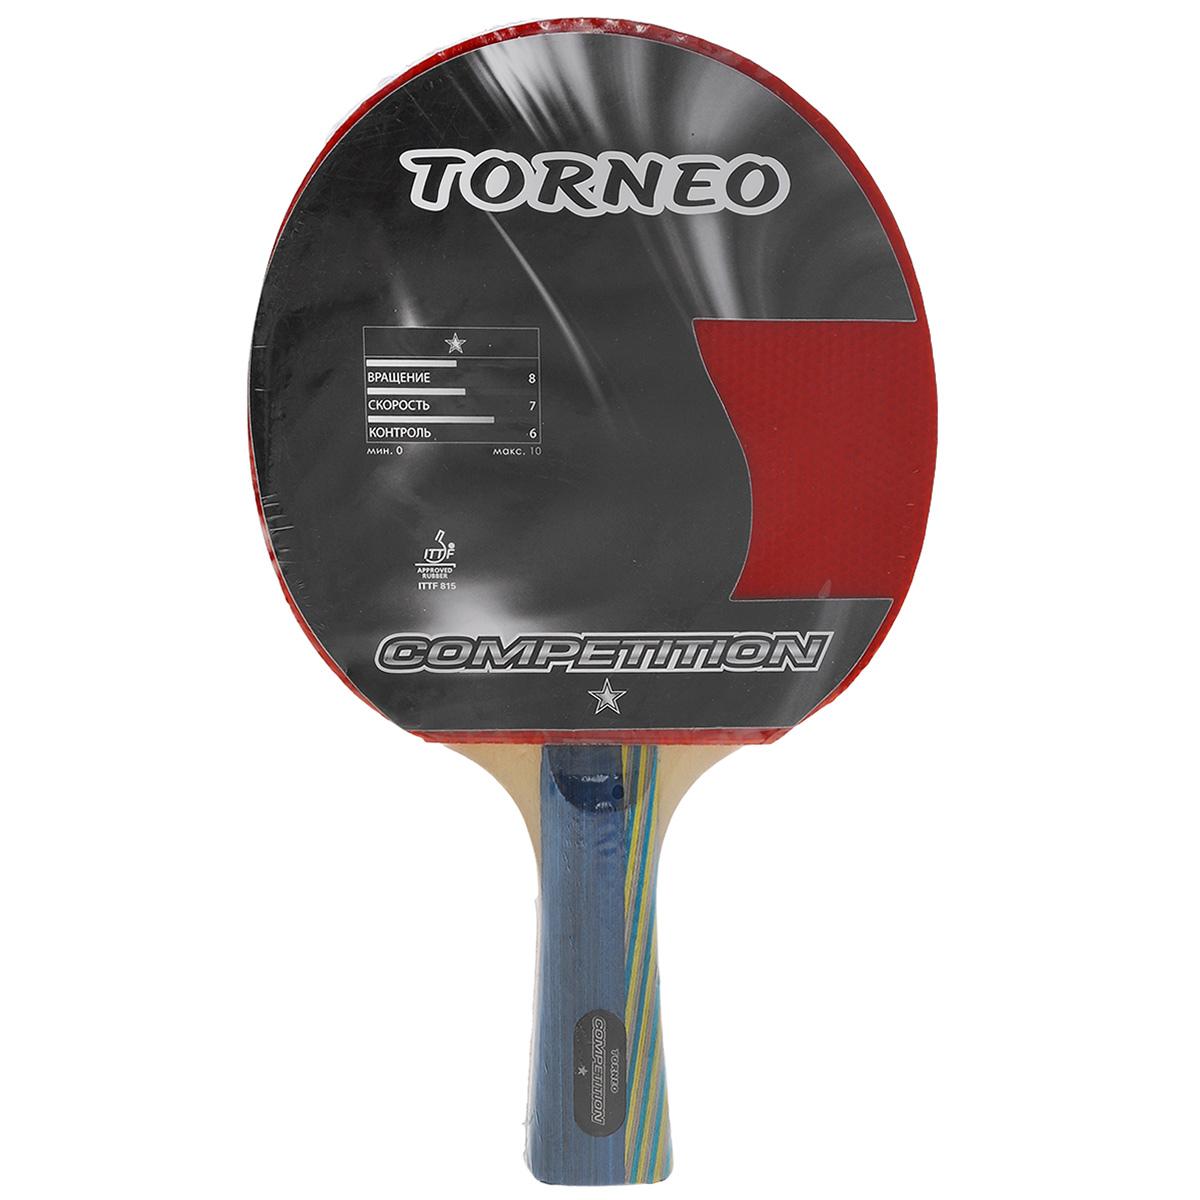 Ракетка для настольного тенниса Torneo Competition ракетка для настольного тенниса torneo tour plustable tennis bat ti b3000